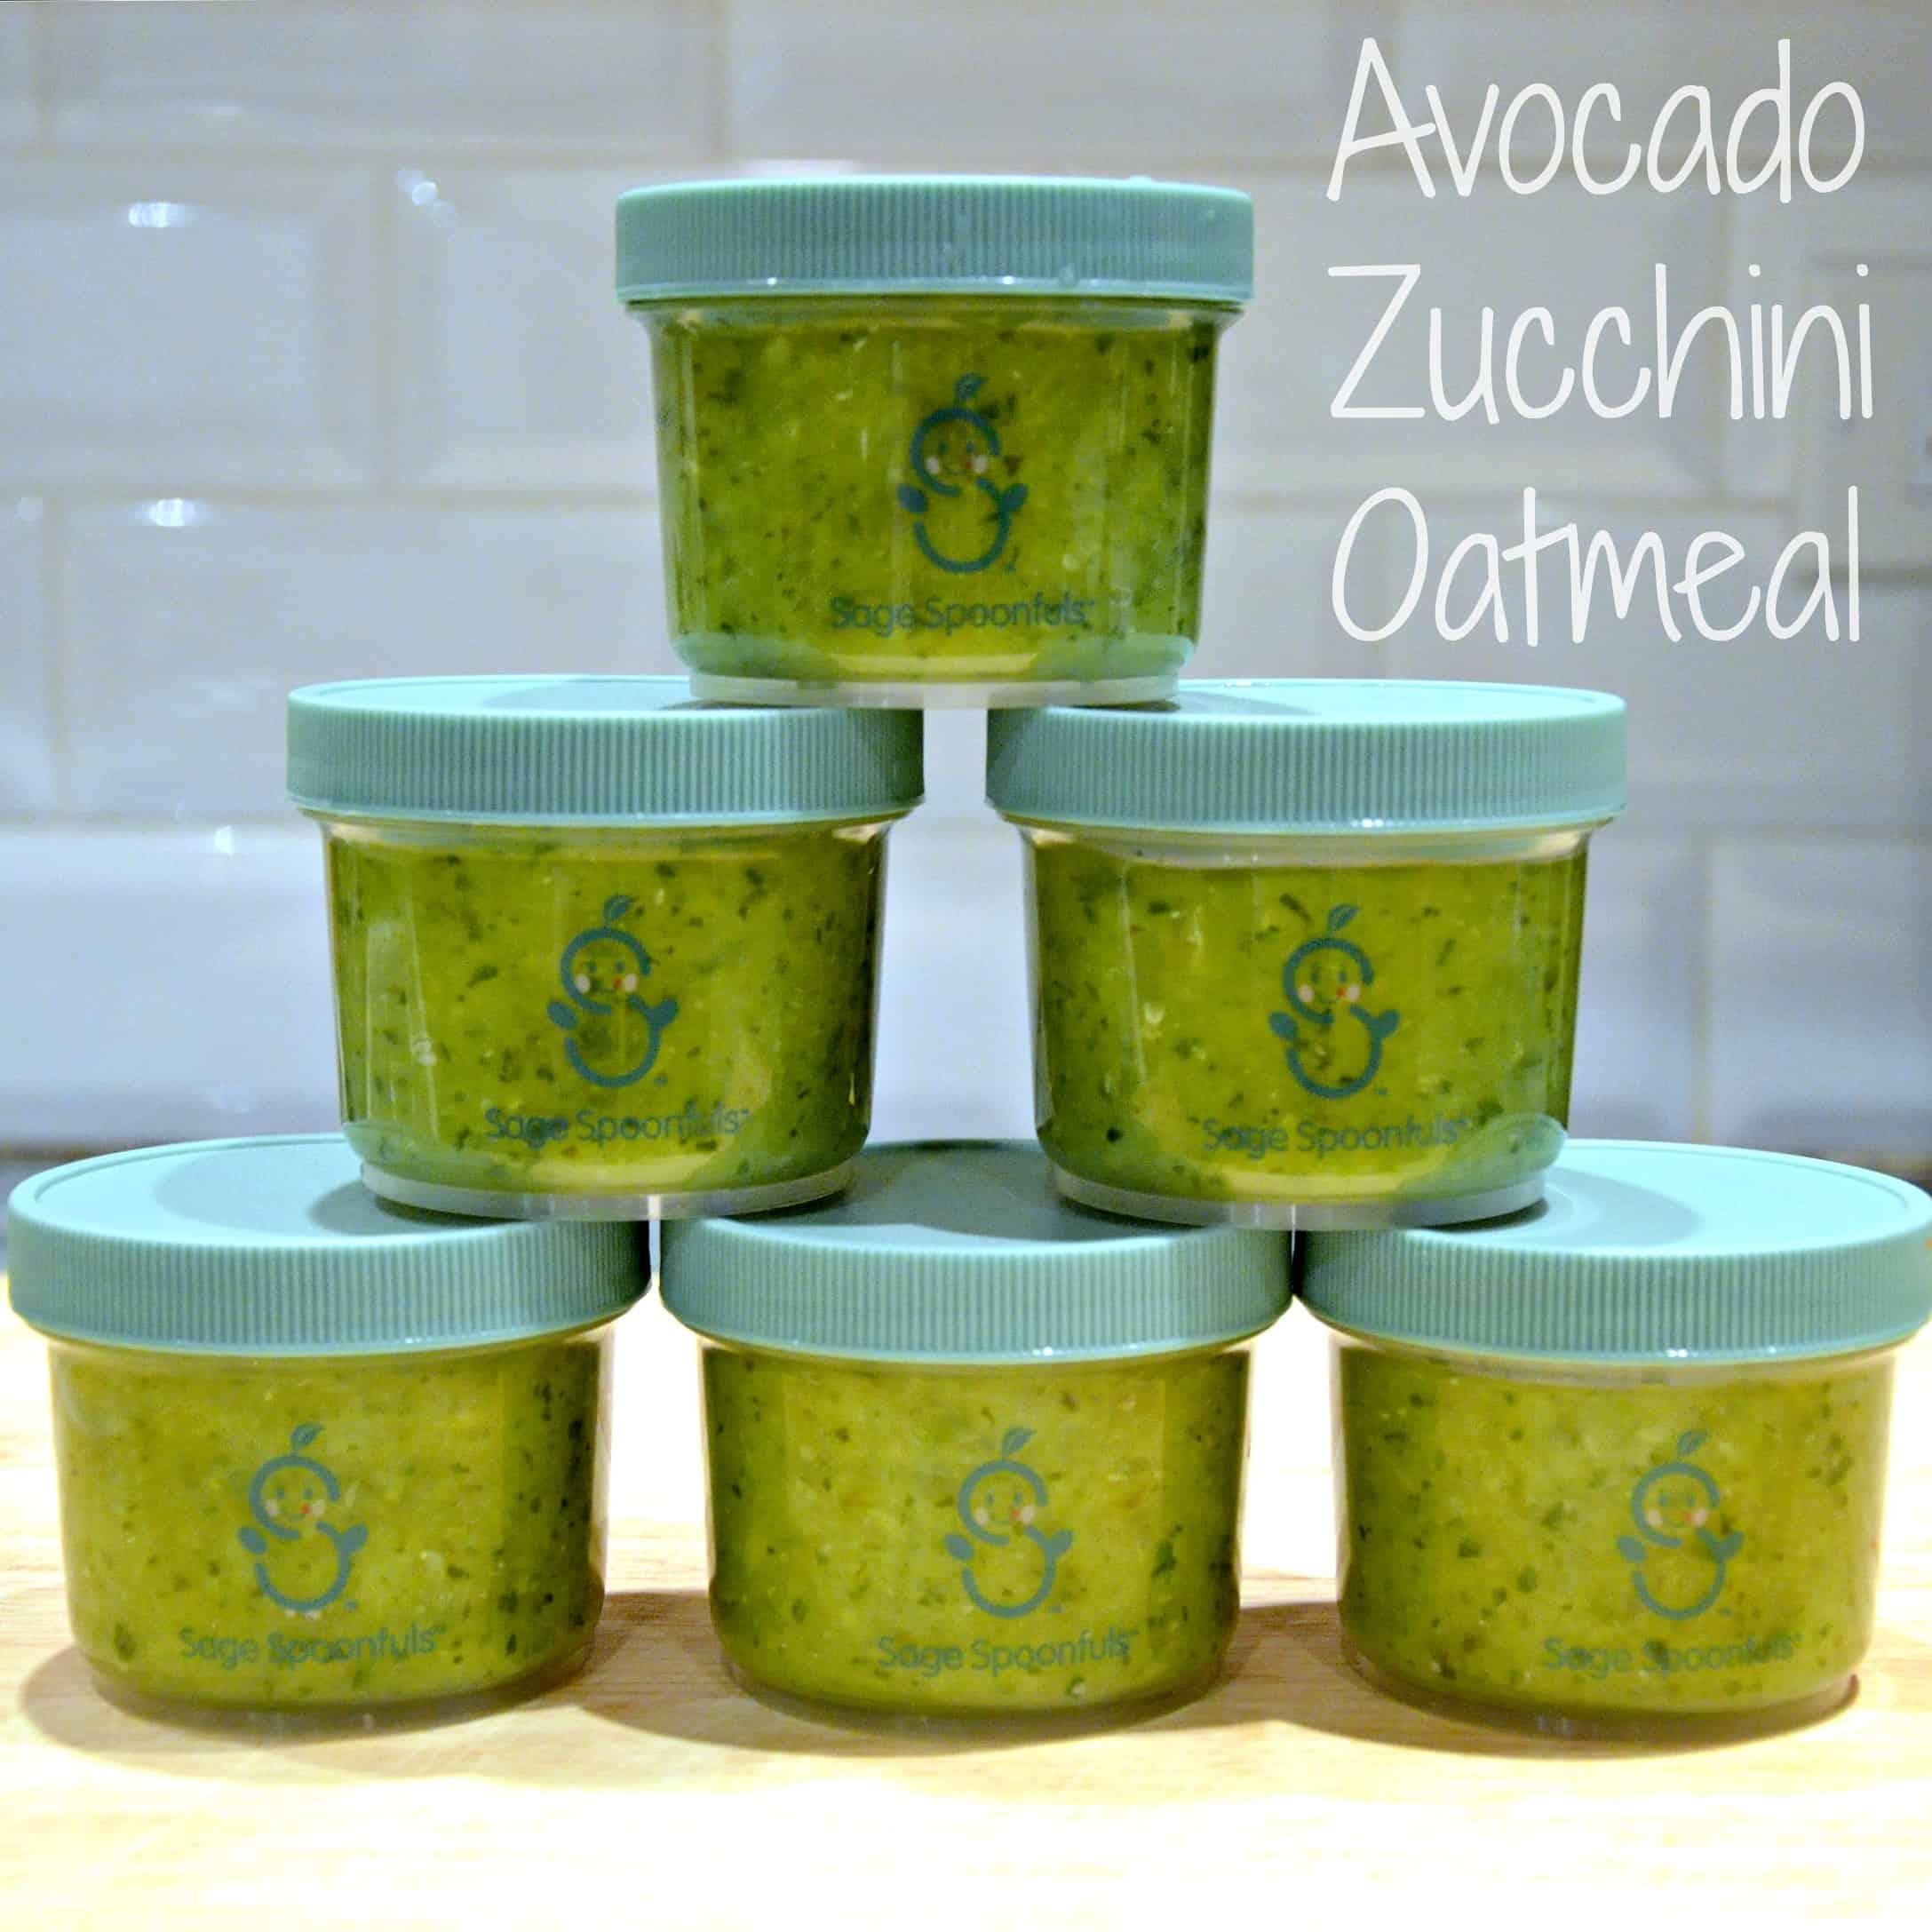 avocado zucchini oatmeal Stage 1 baby food recipe